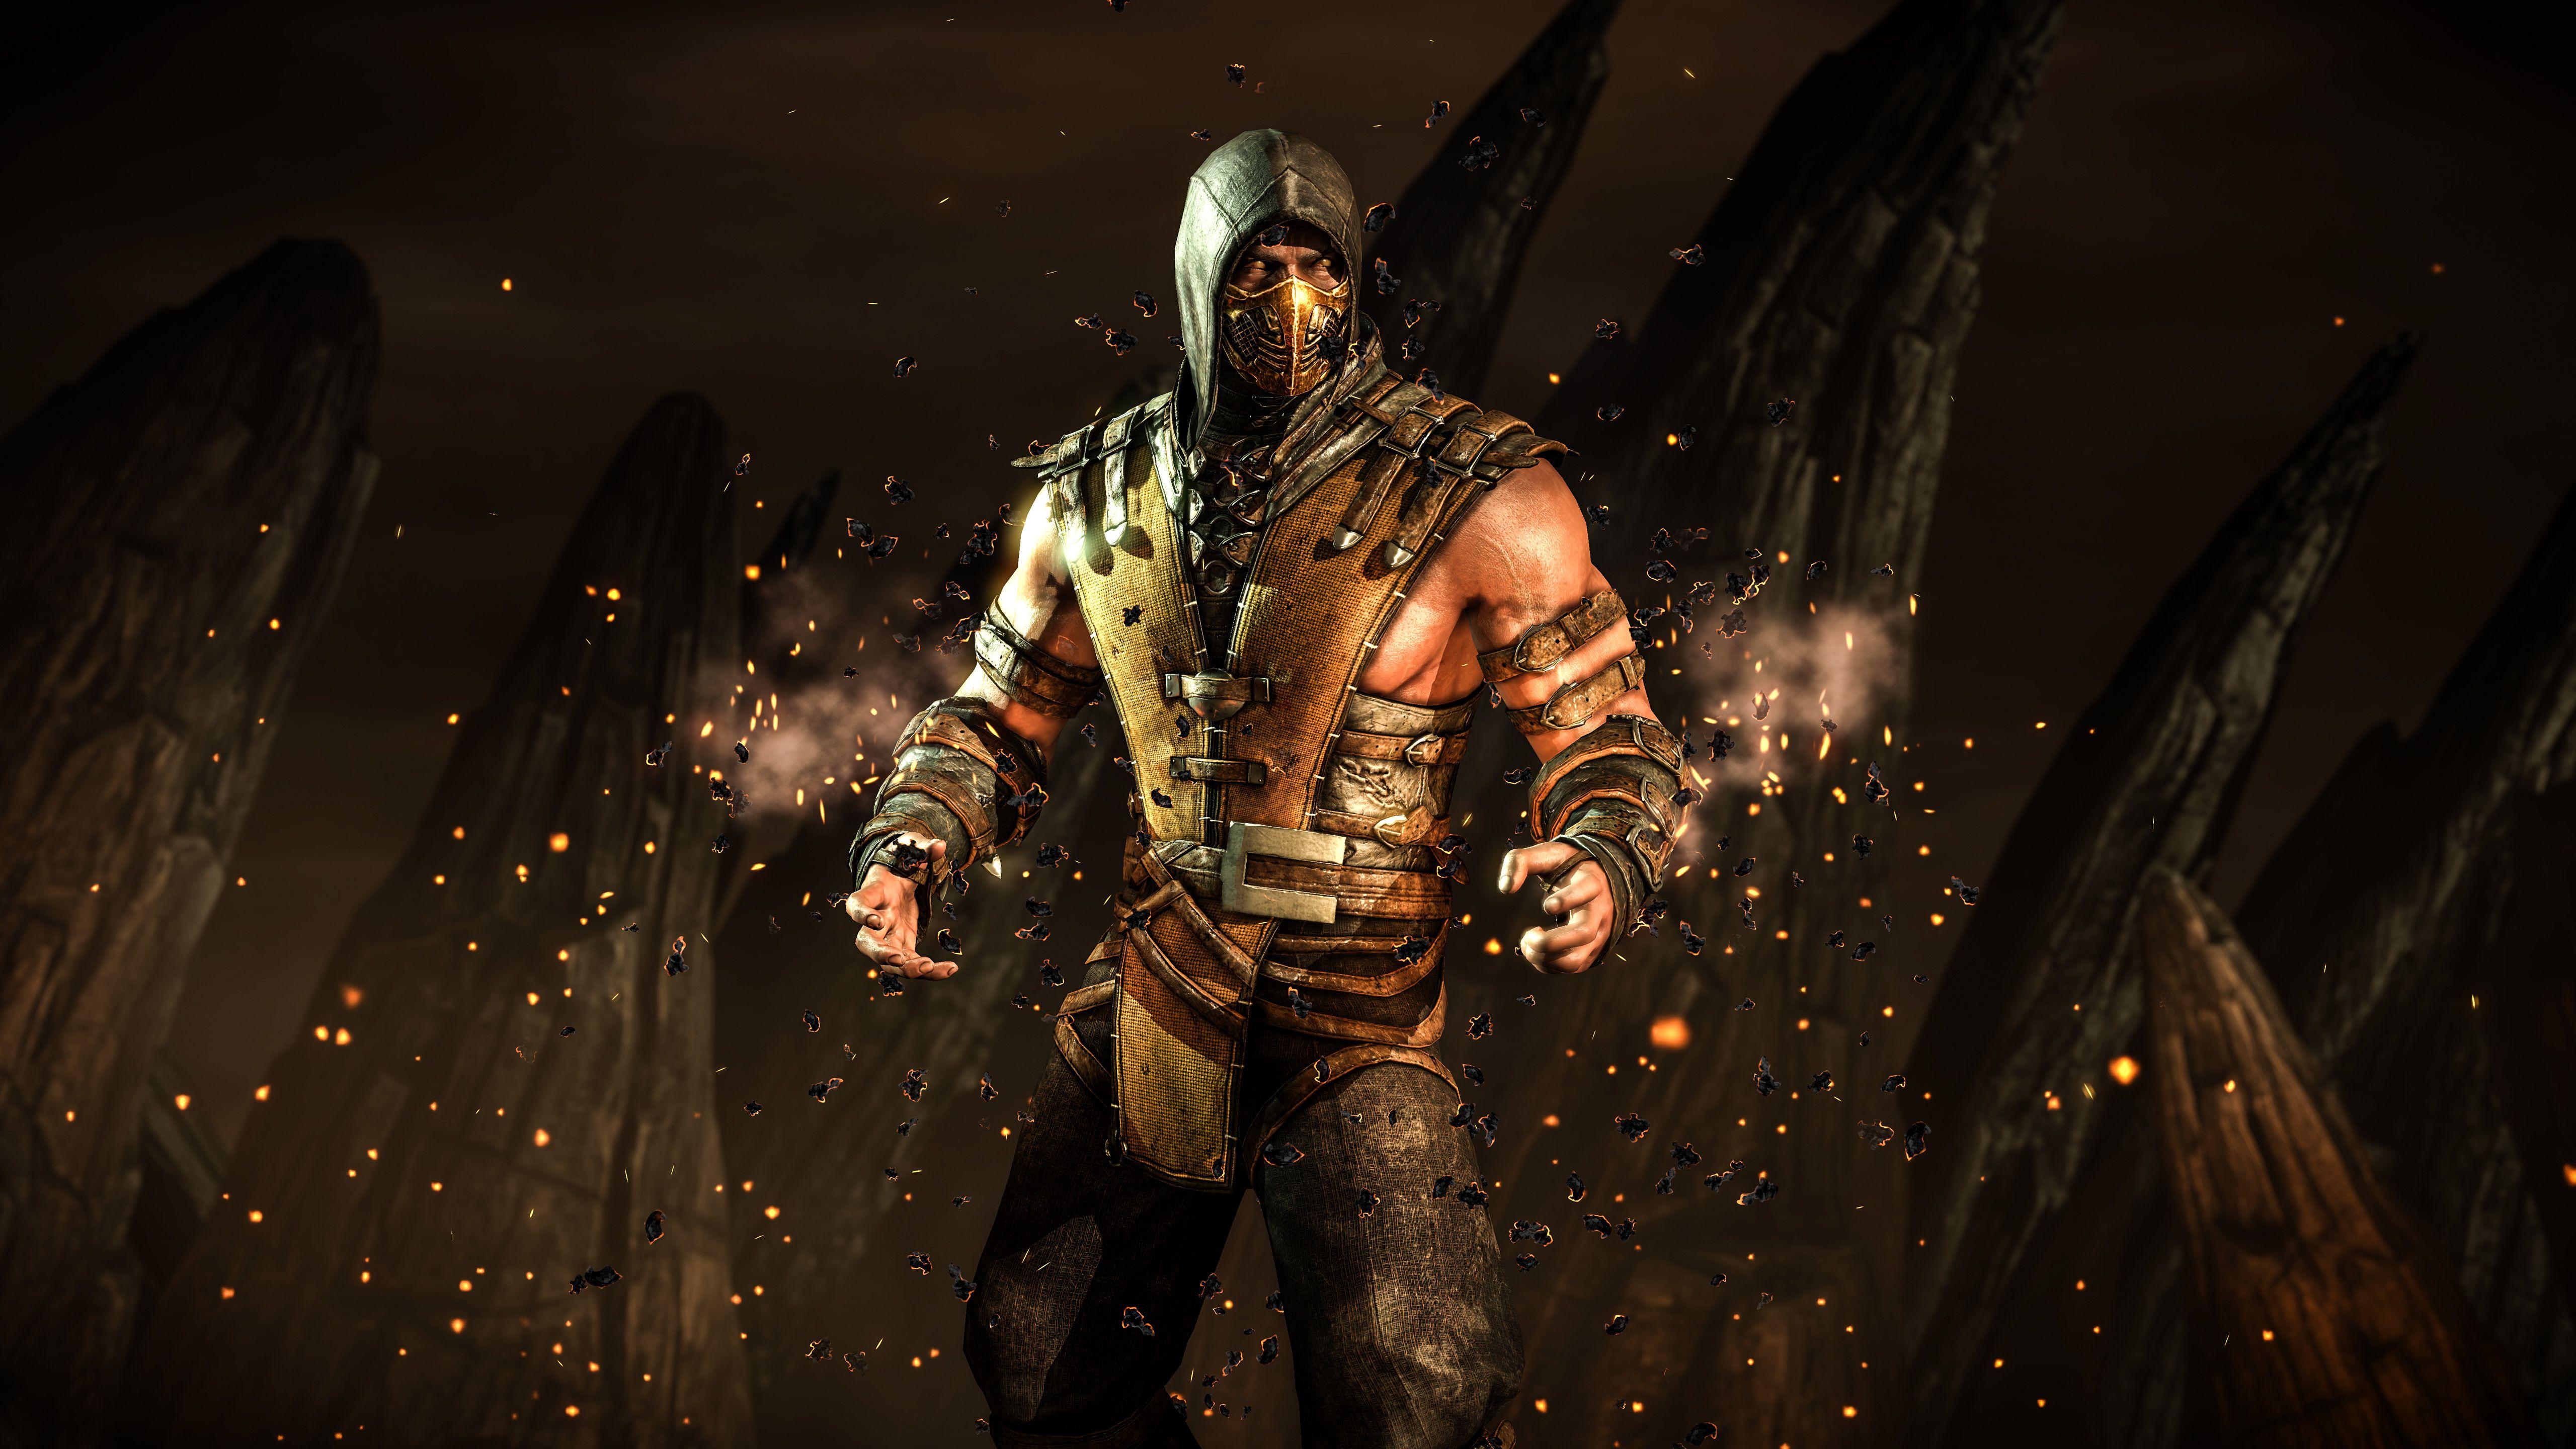 Mortal Kombat X Scorpion Hellfire 4k Wallpaper ซาม ไร ศ ลปะร ปกะโหลก